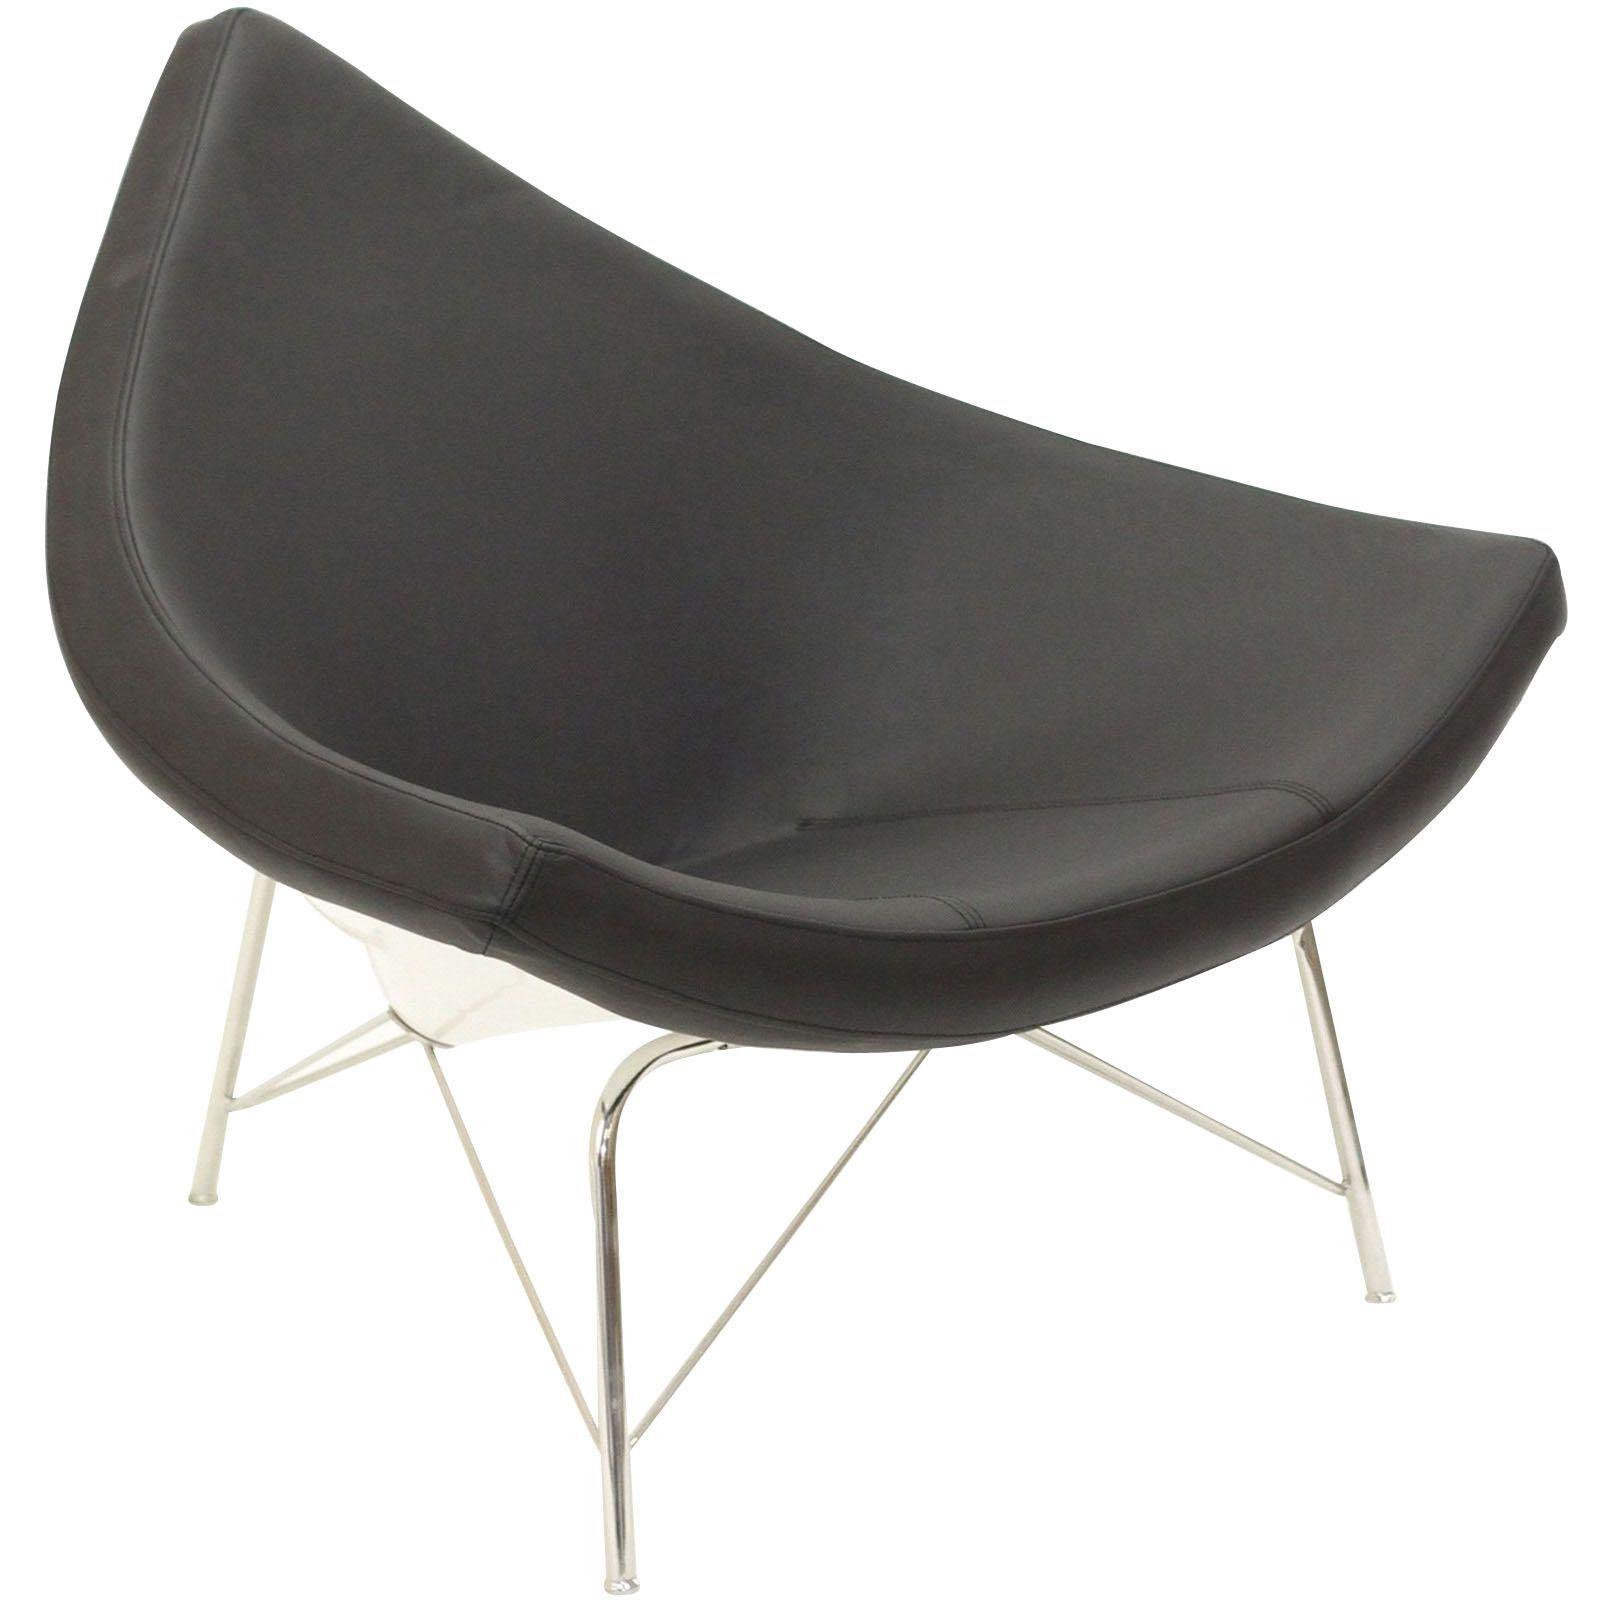 Triangular Foam Lounge Chair Stoelen Fauteuils